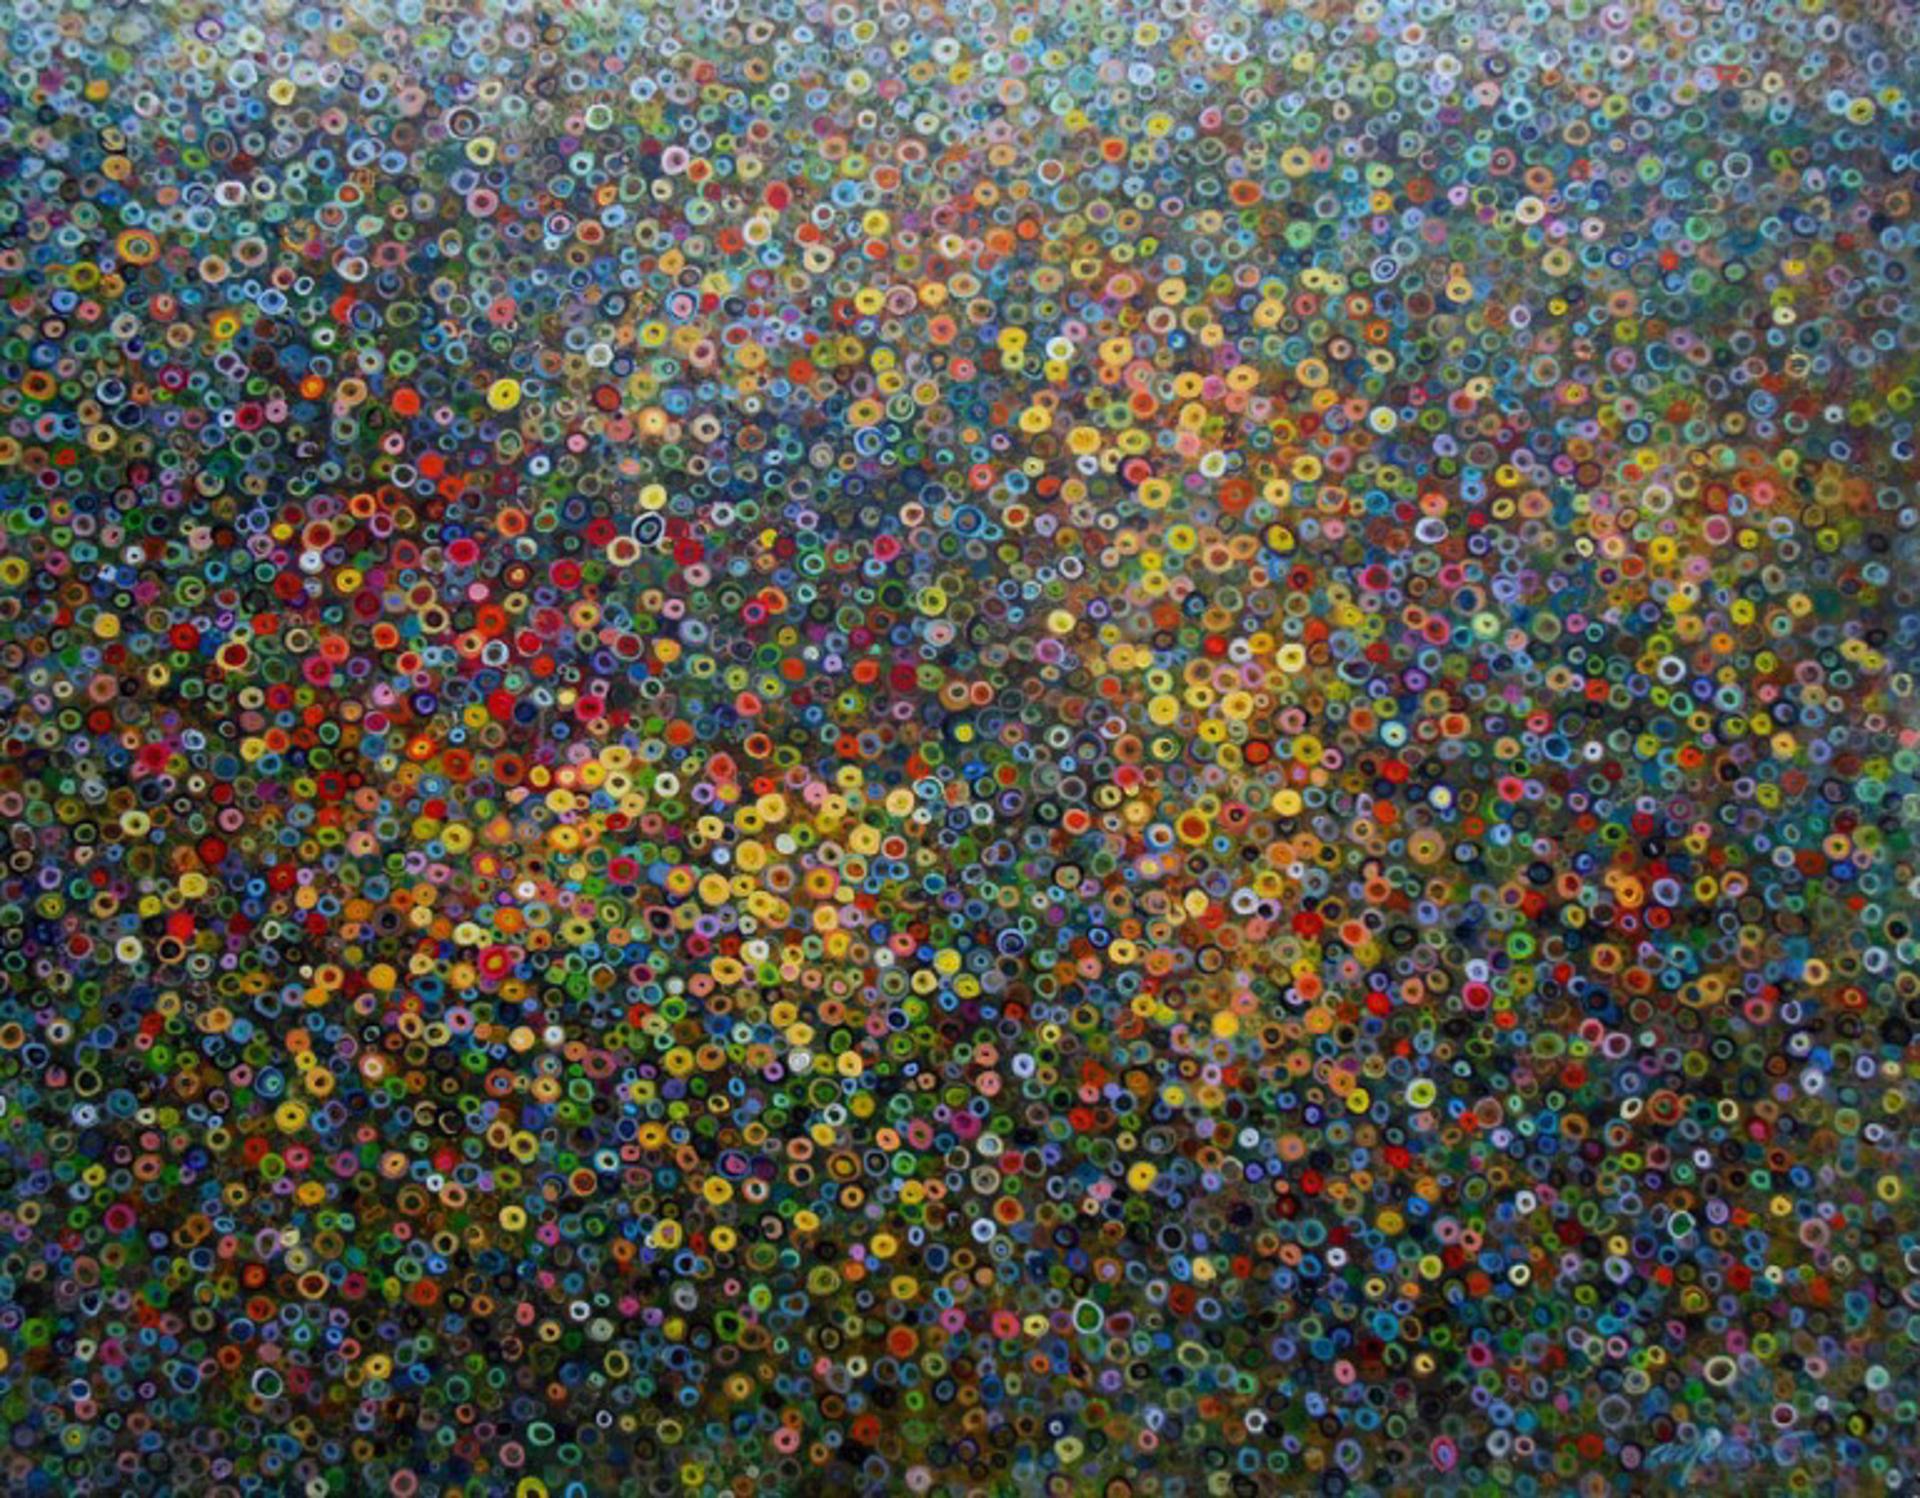 Dust in the Wind by Marcio Diaz